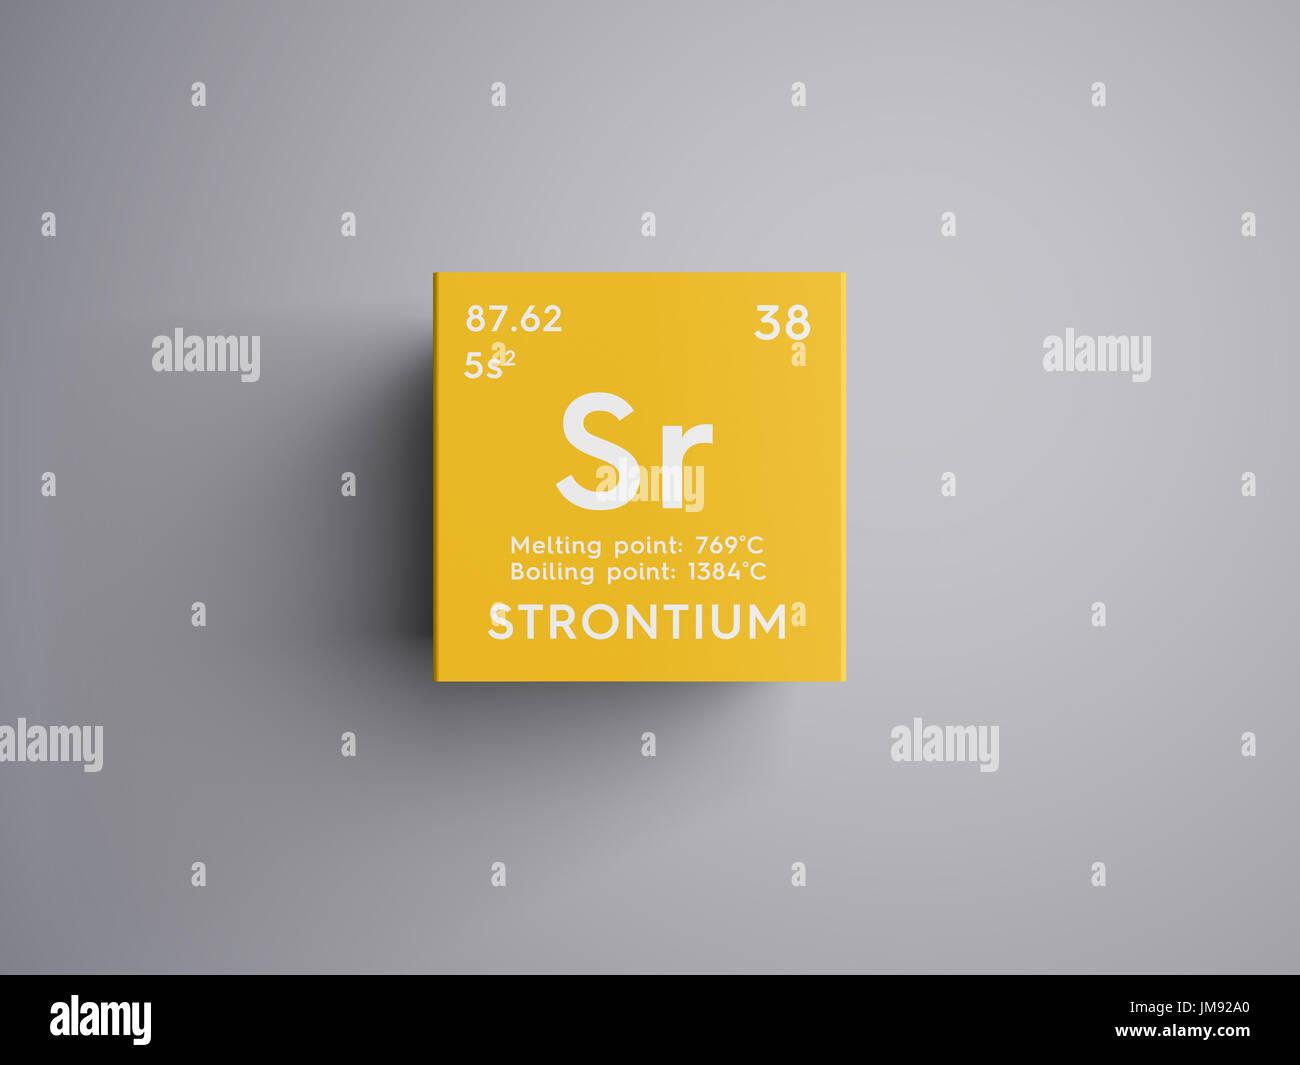 Strontium alkaline earth metals chemical element of mendeleevs alkaline earth metals chemical element of mendeleevs periodic table strontium in square cube creative concept urtaz Gallery